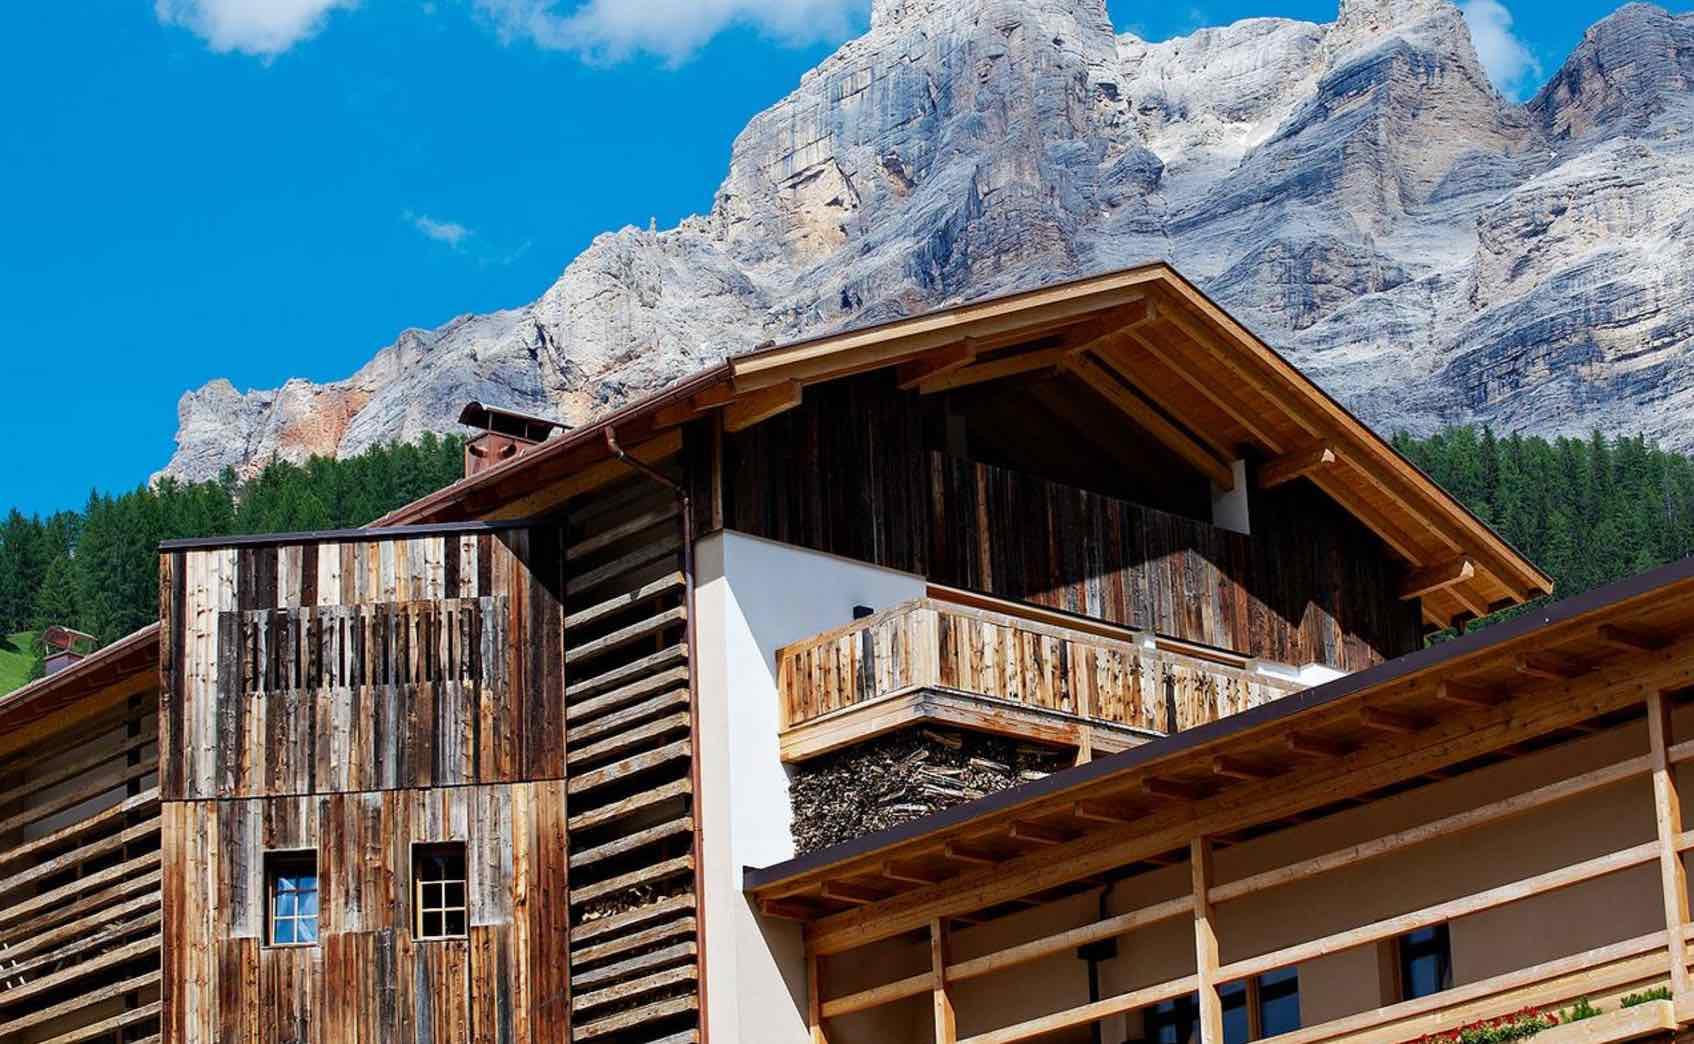 Lagació Mountain Residence - Hotels Dolomites Italy 5.jpg